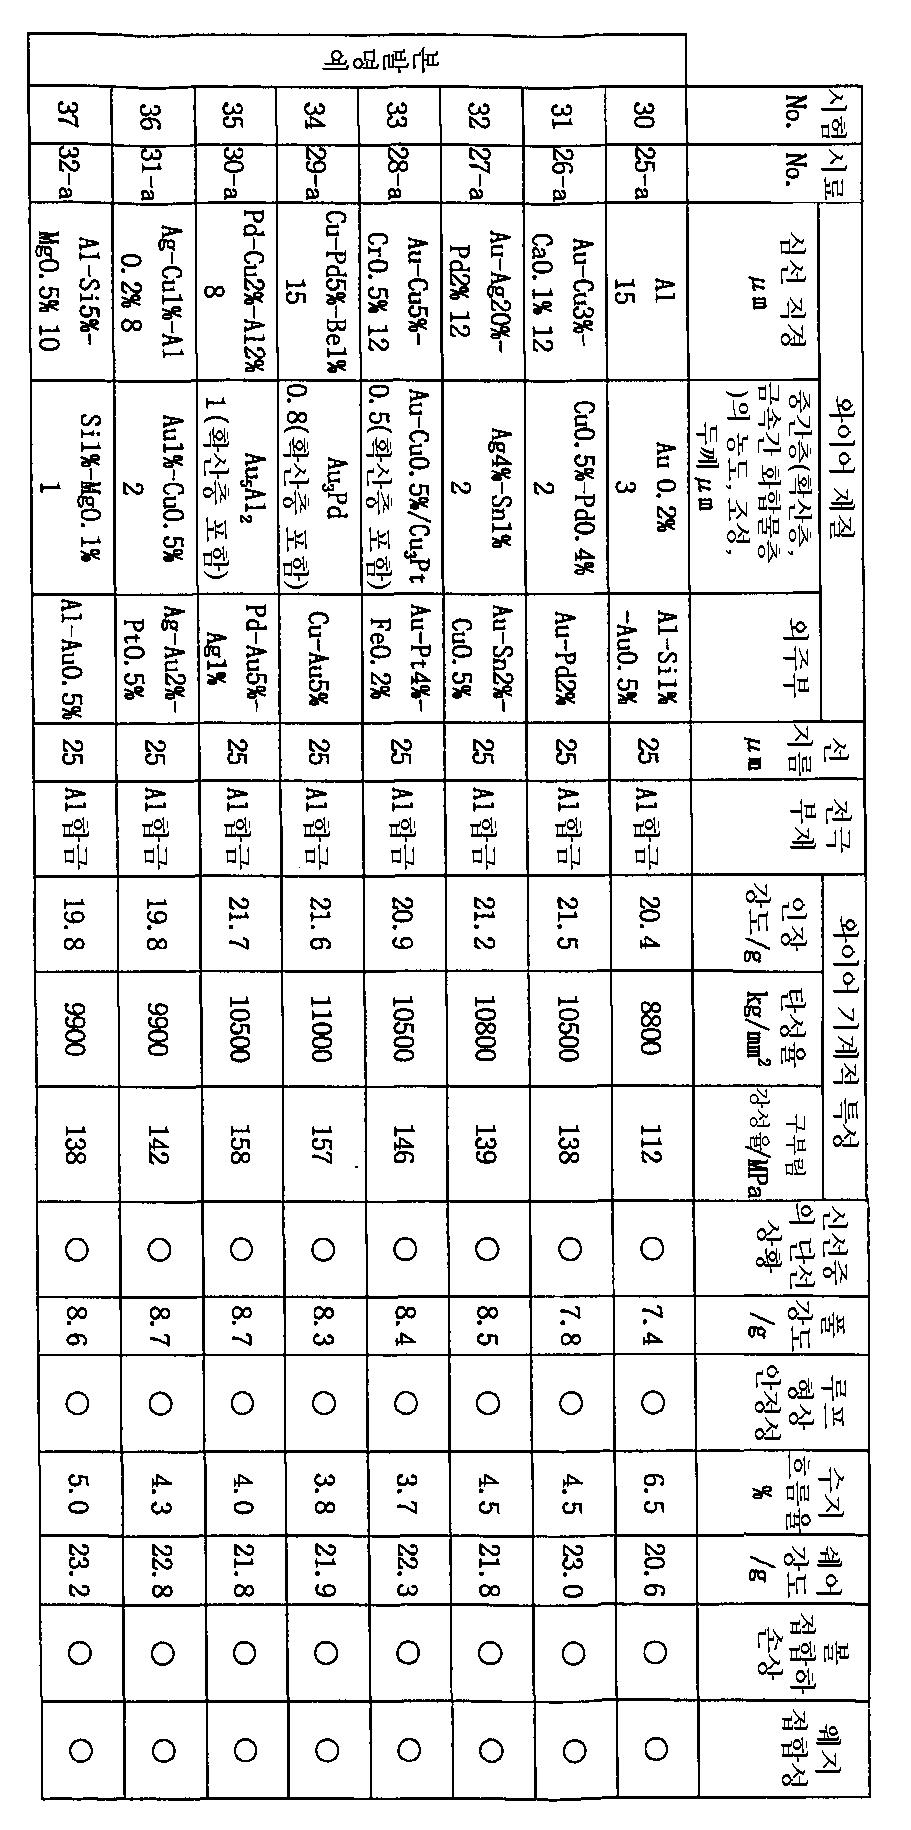 Figure 112003009118208-pct00004